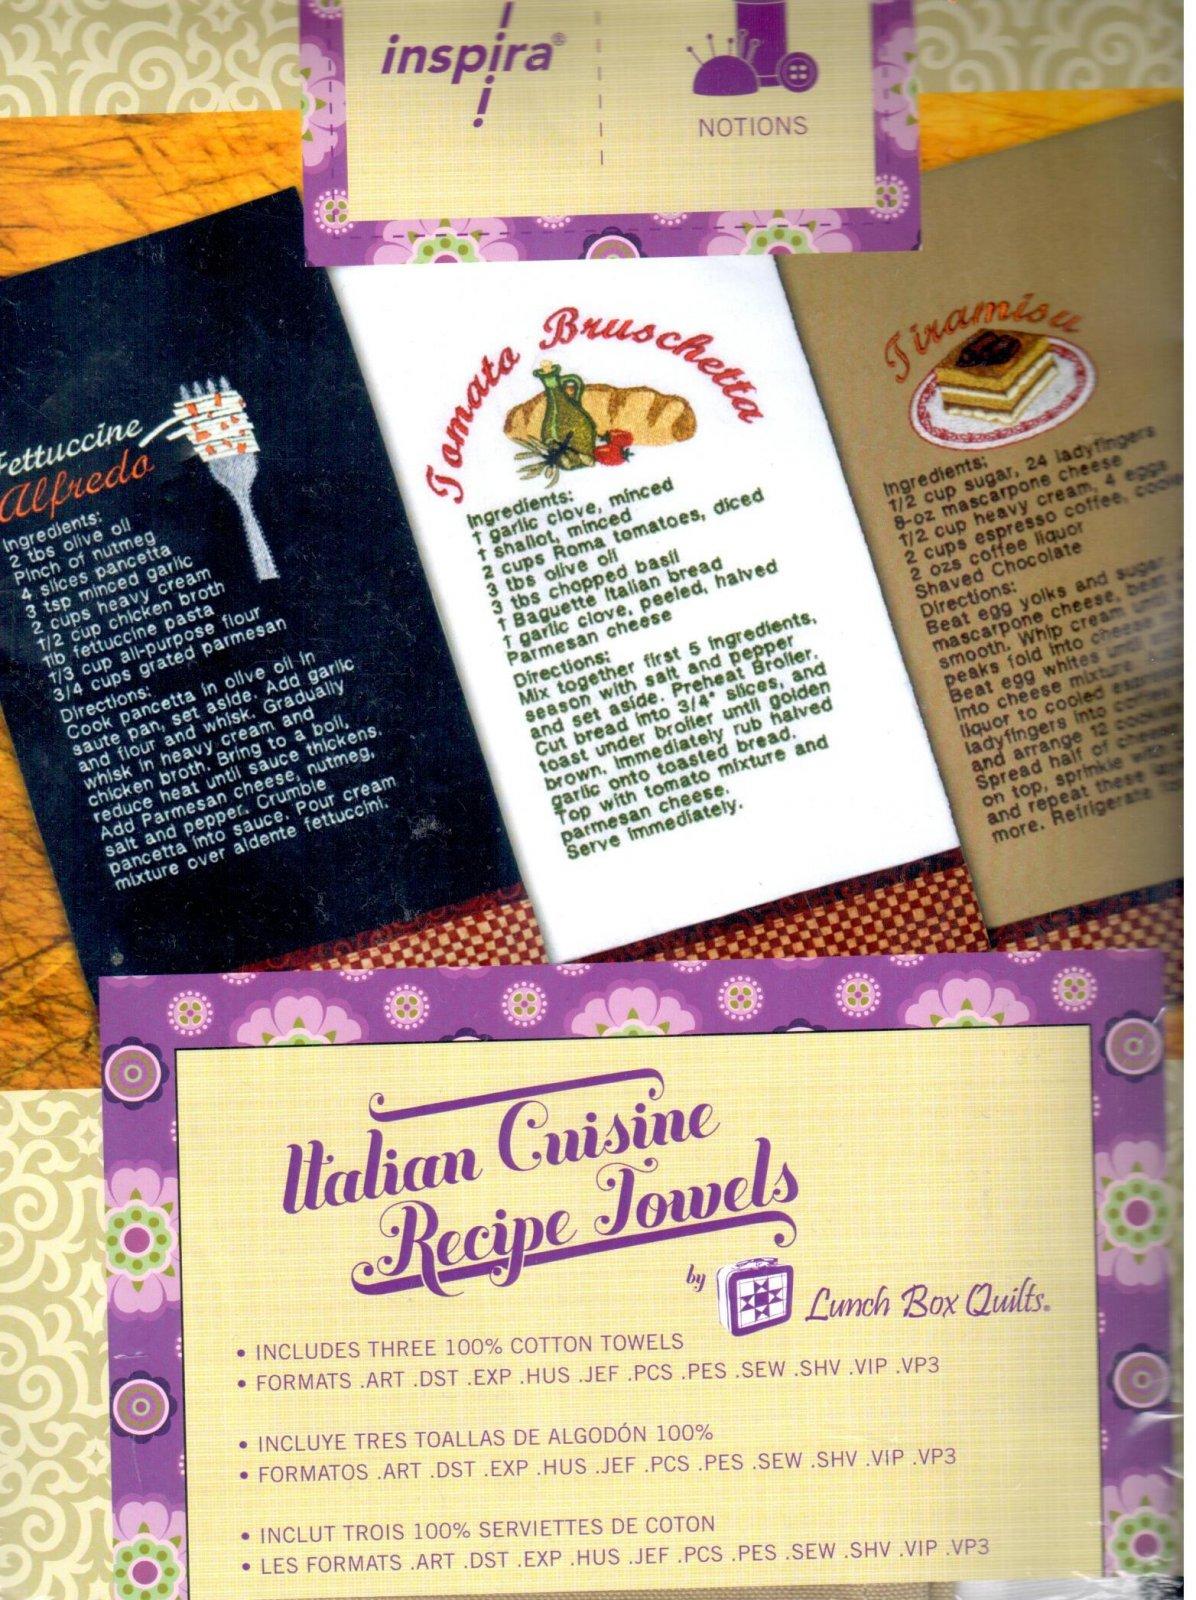 Inspira Italian Cuisine Recipe Towels Embroidery Designs